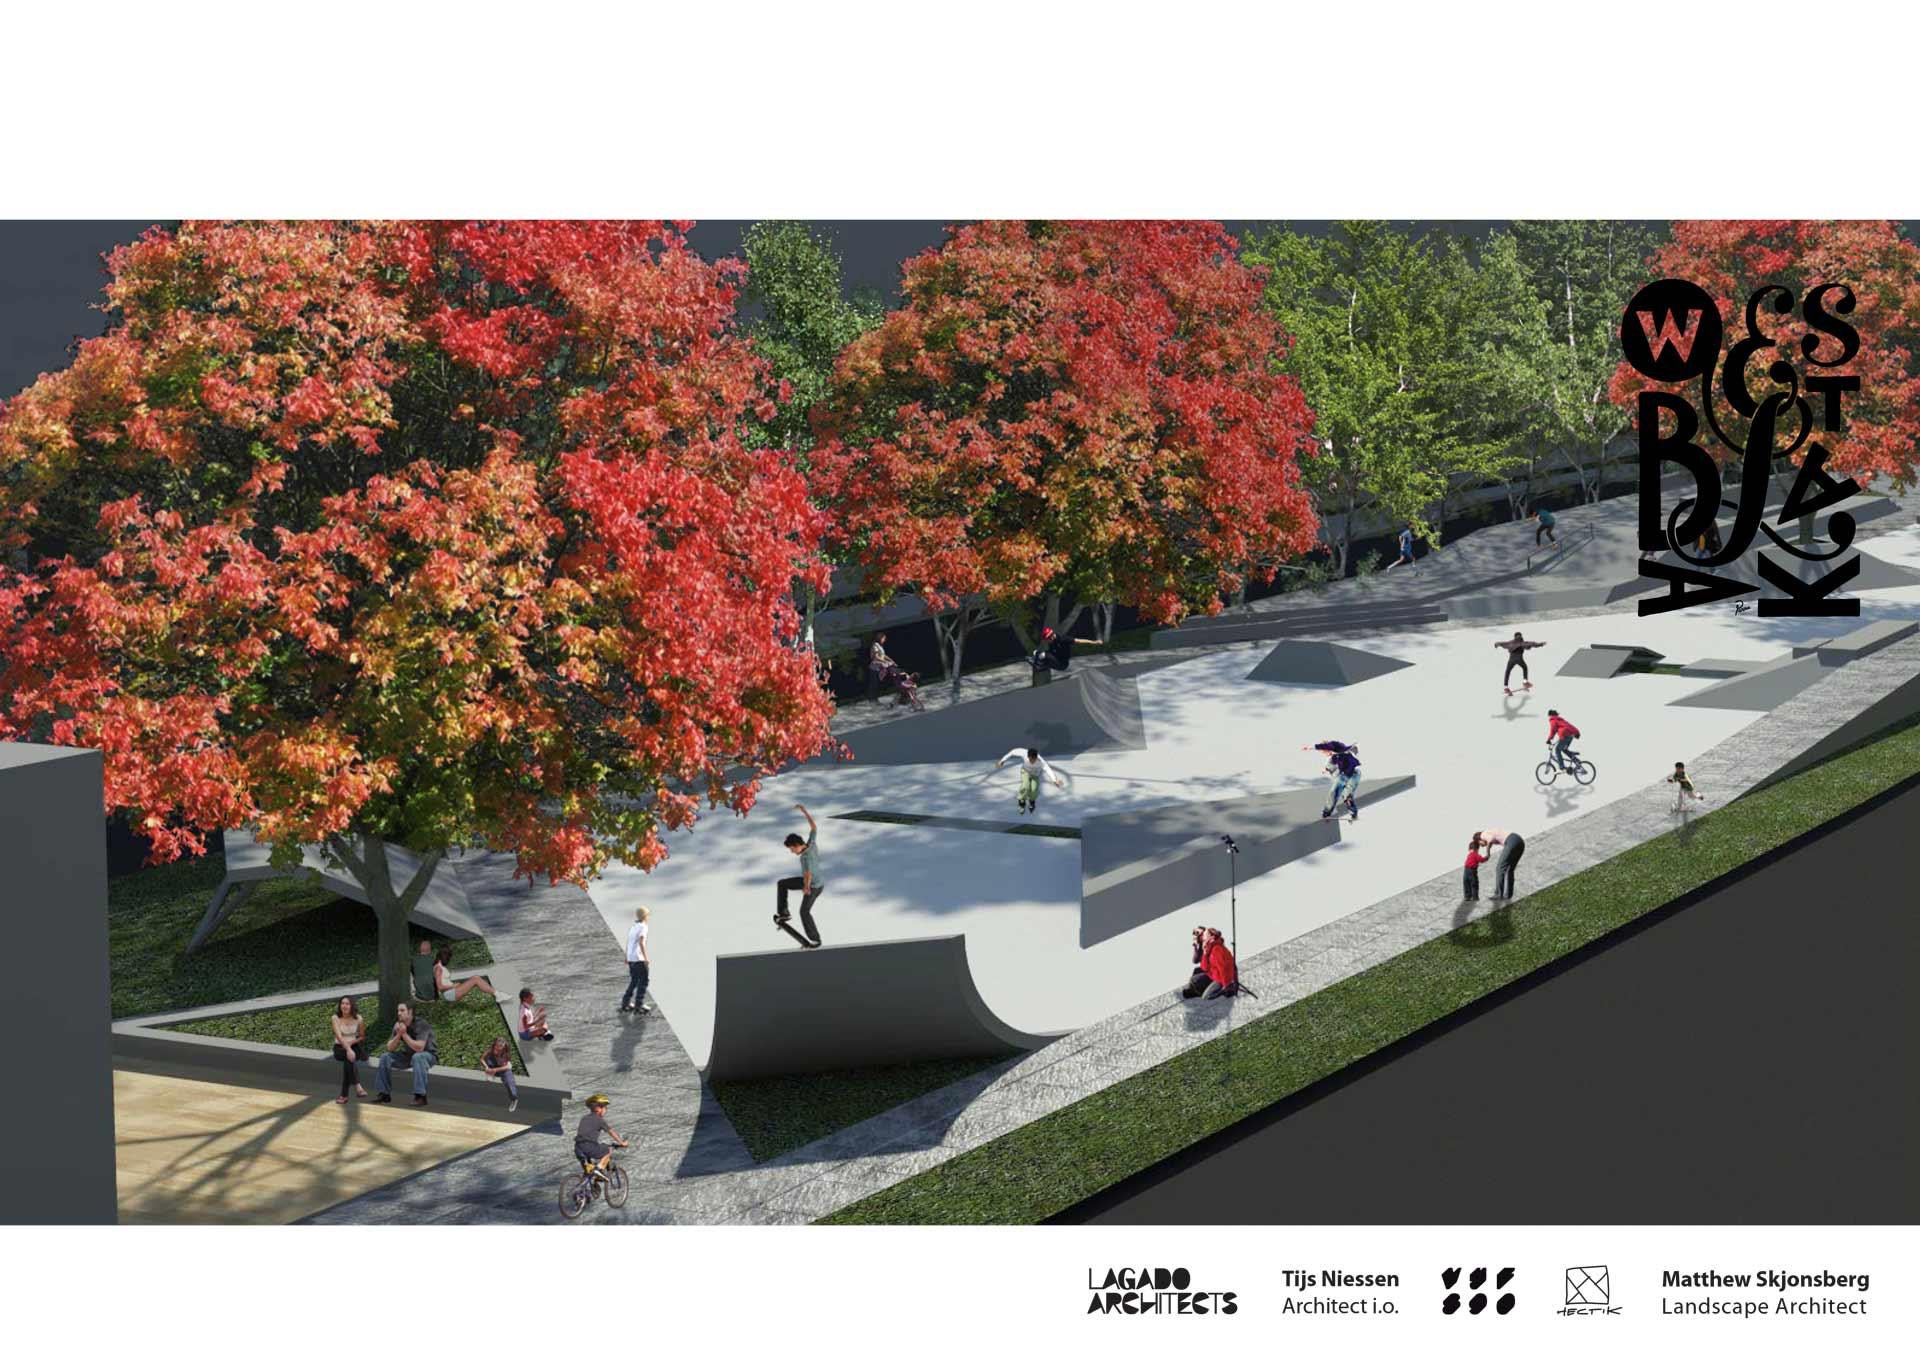 Westblaak-Rotterdam-skatepark-LAGADO-architects-public-space-urban-youth-play-proposal1